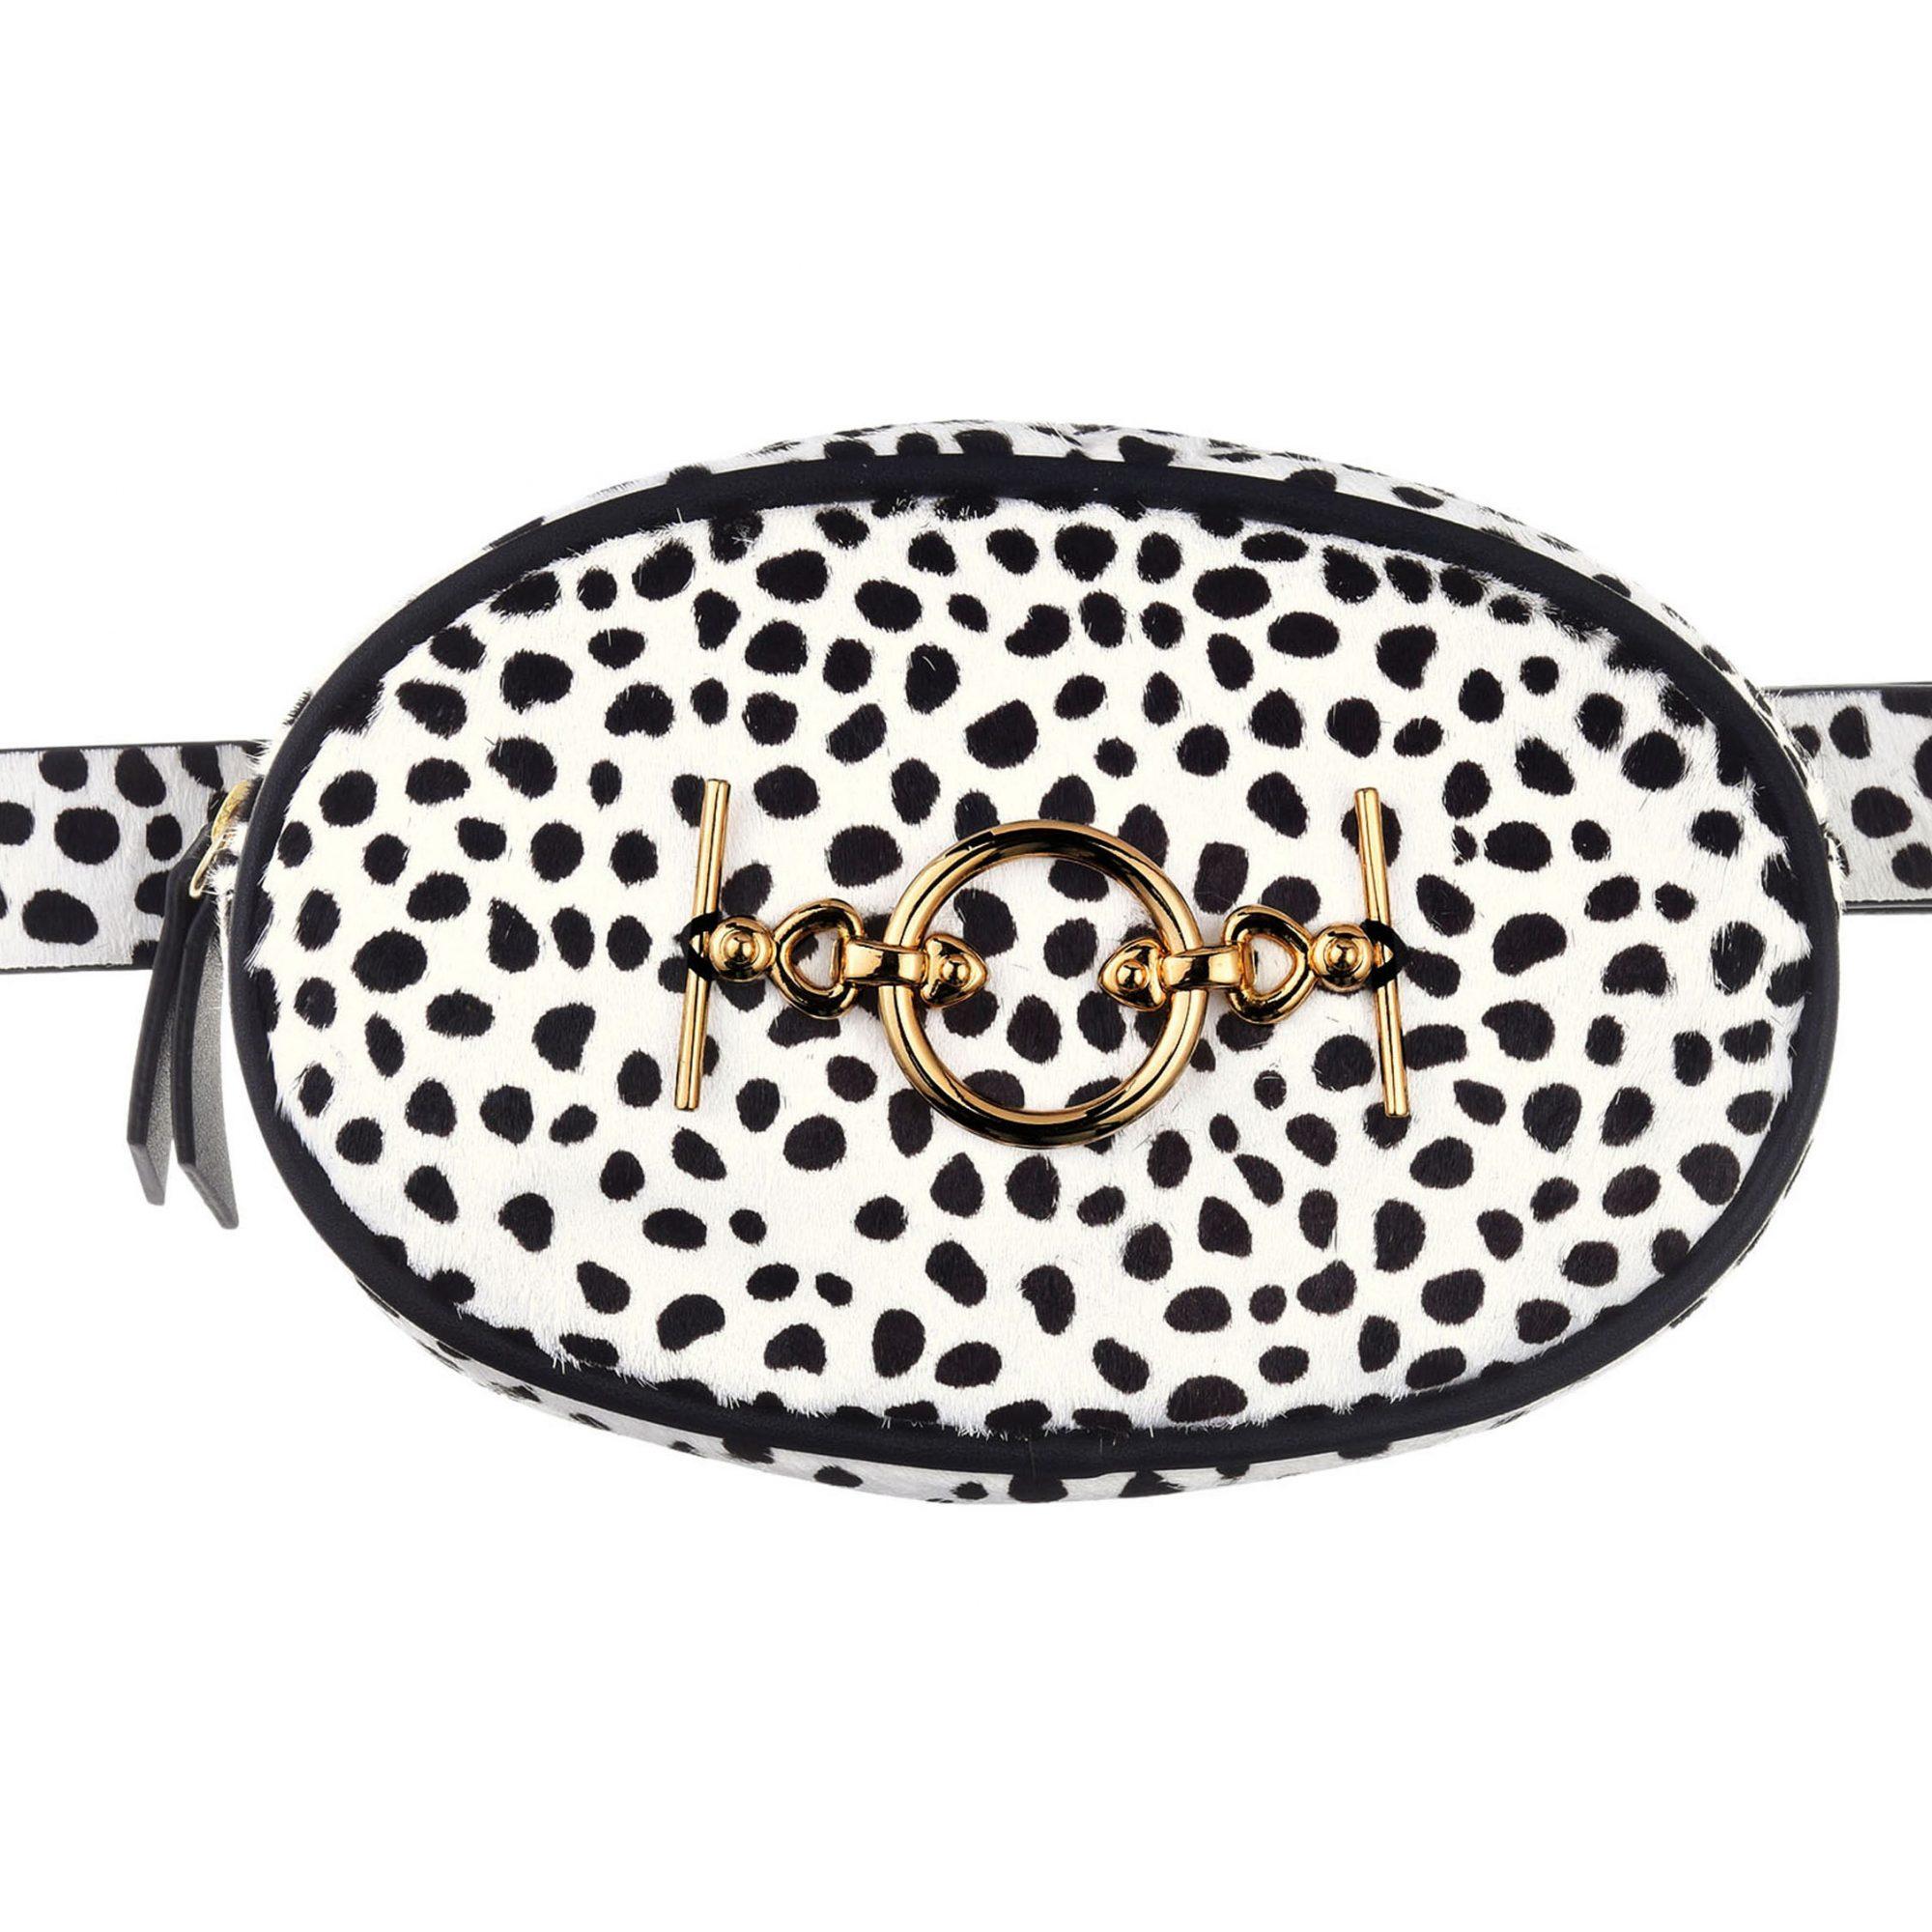 fanny pack topshop leopard purse belt